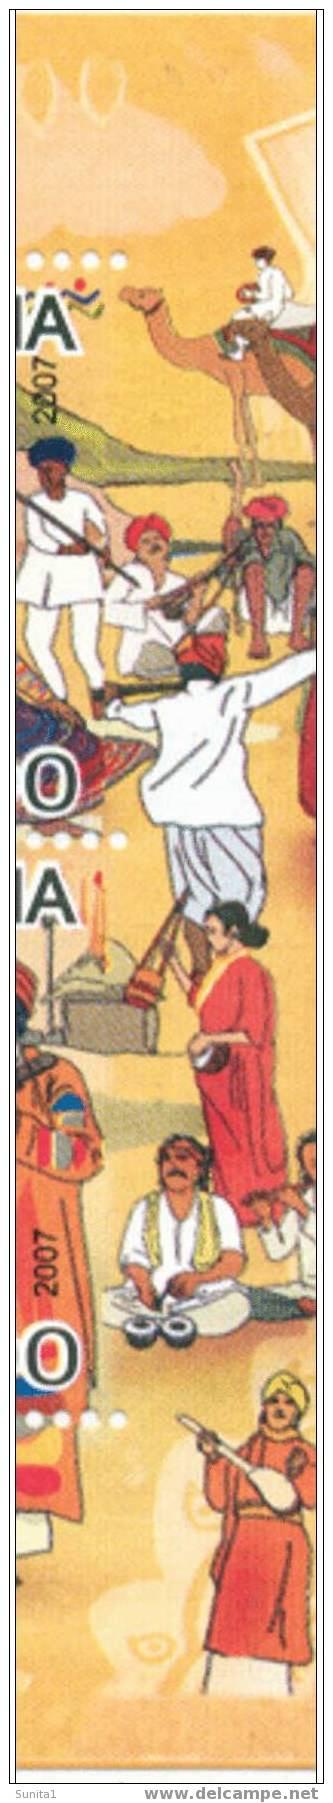 Perforation Error, Elephant, Camel, Musical Instruments, Carnival, Puppet, Bridge, Costumes,fairs, INDIA - Elephants